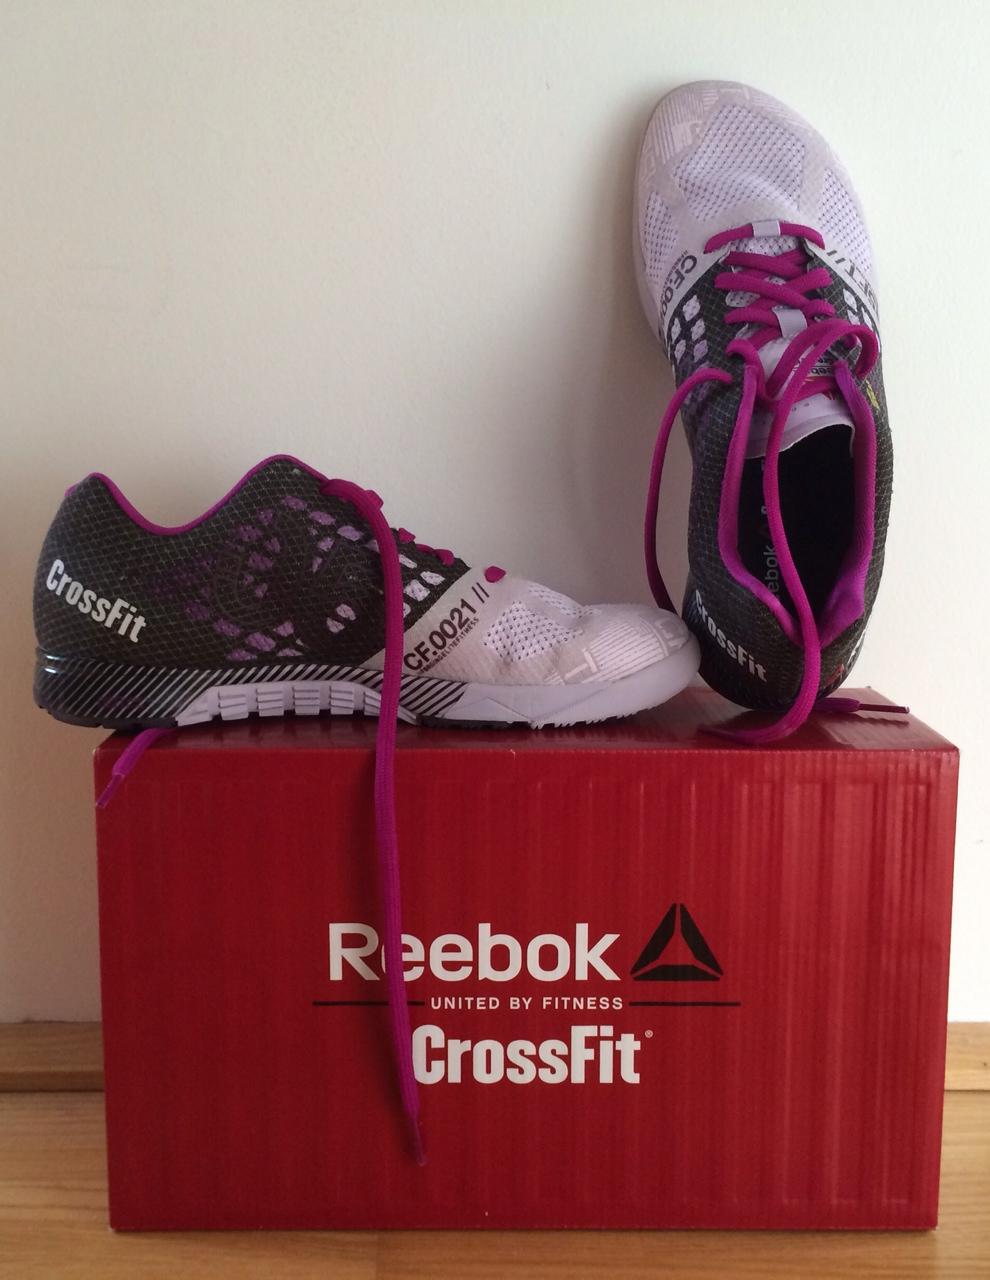 Crossfit Sportschuhe Damen | der sport